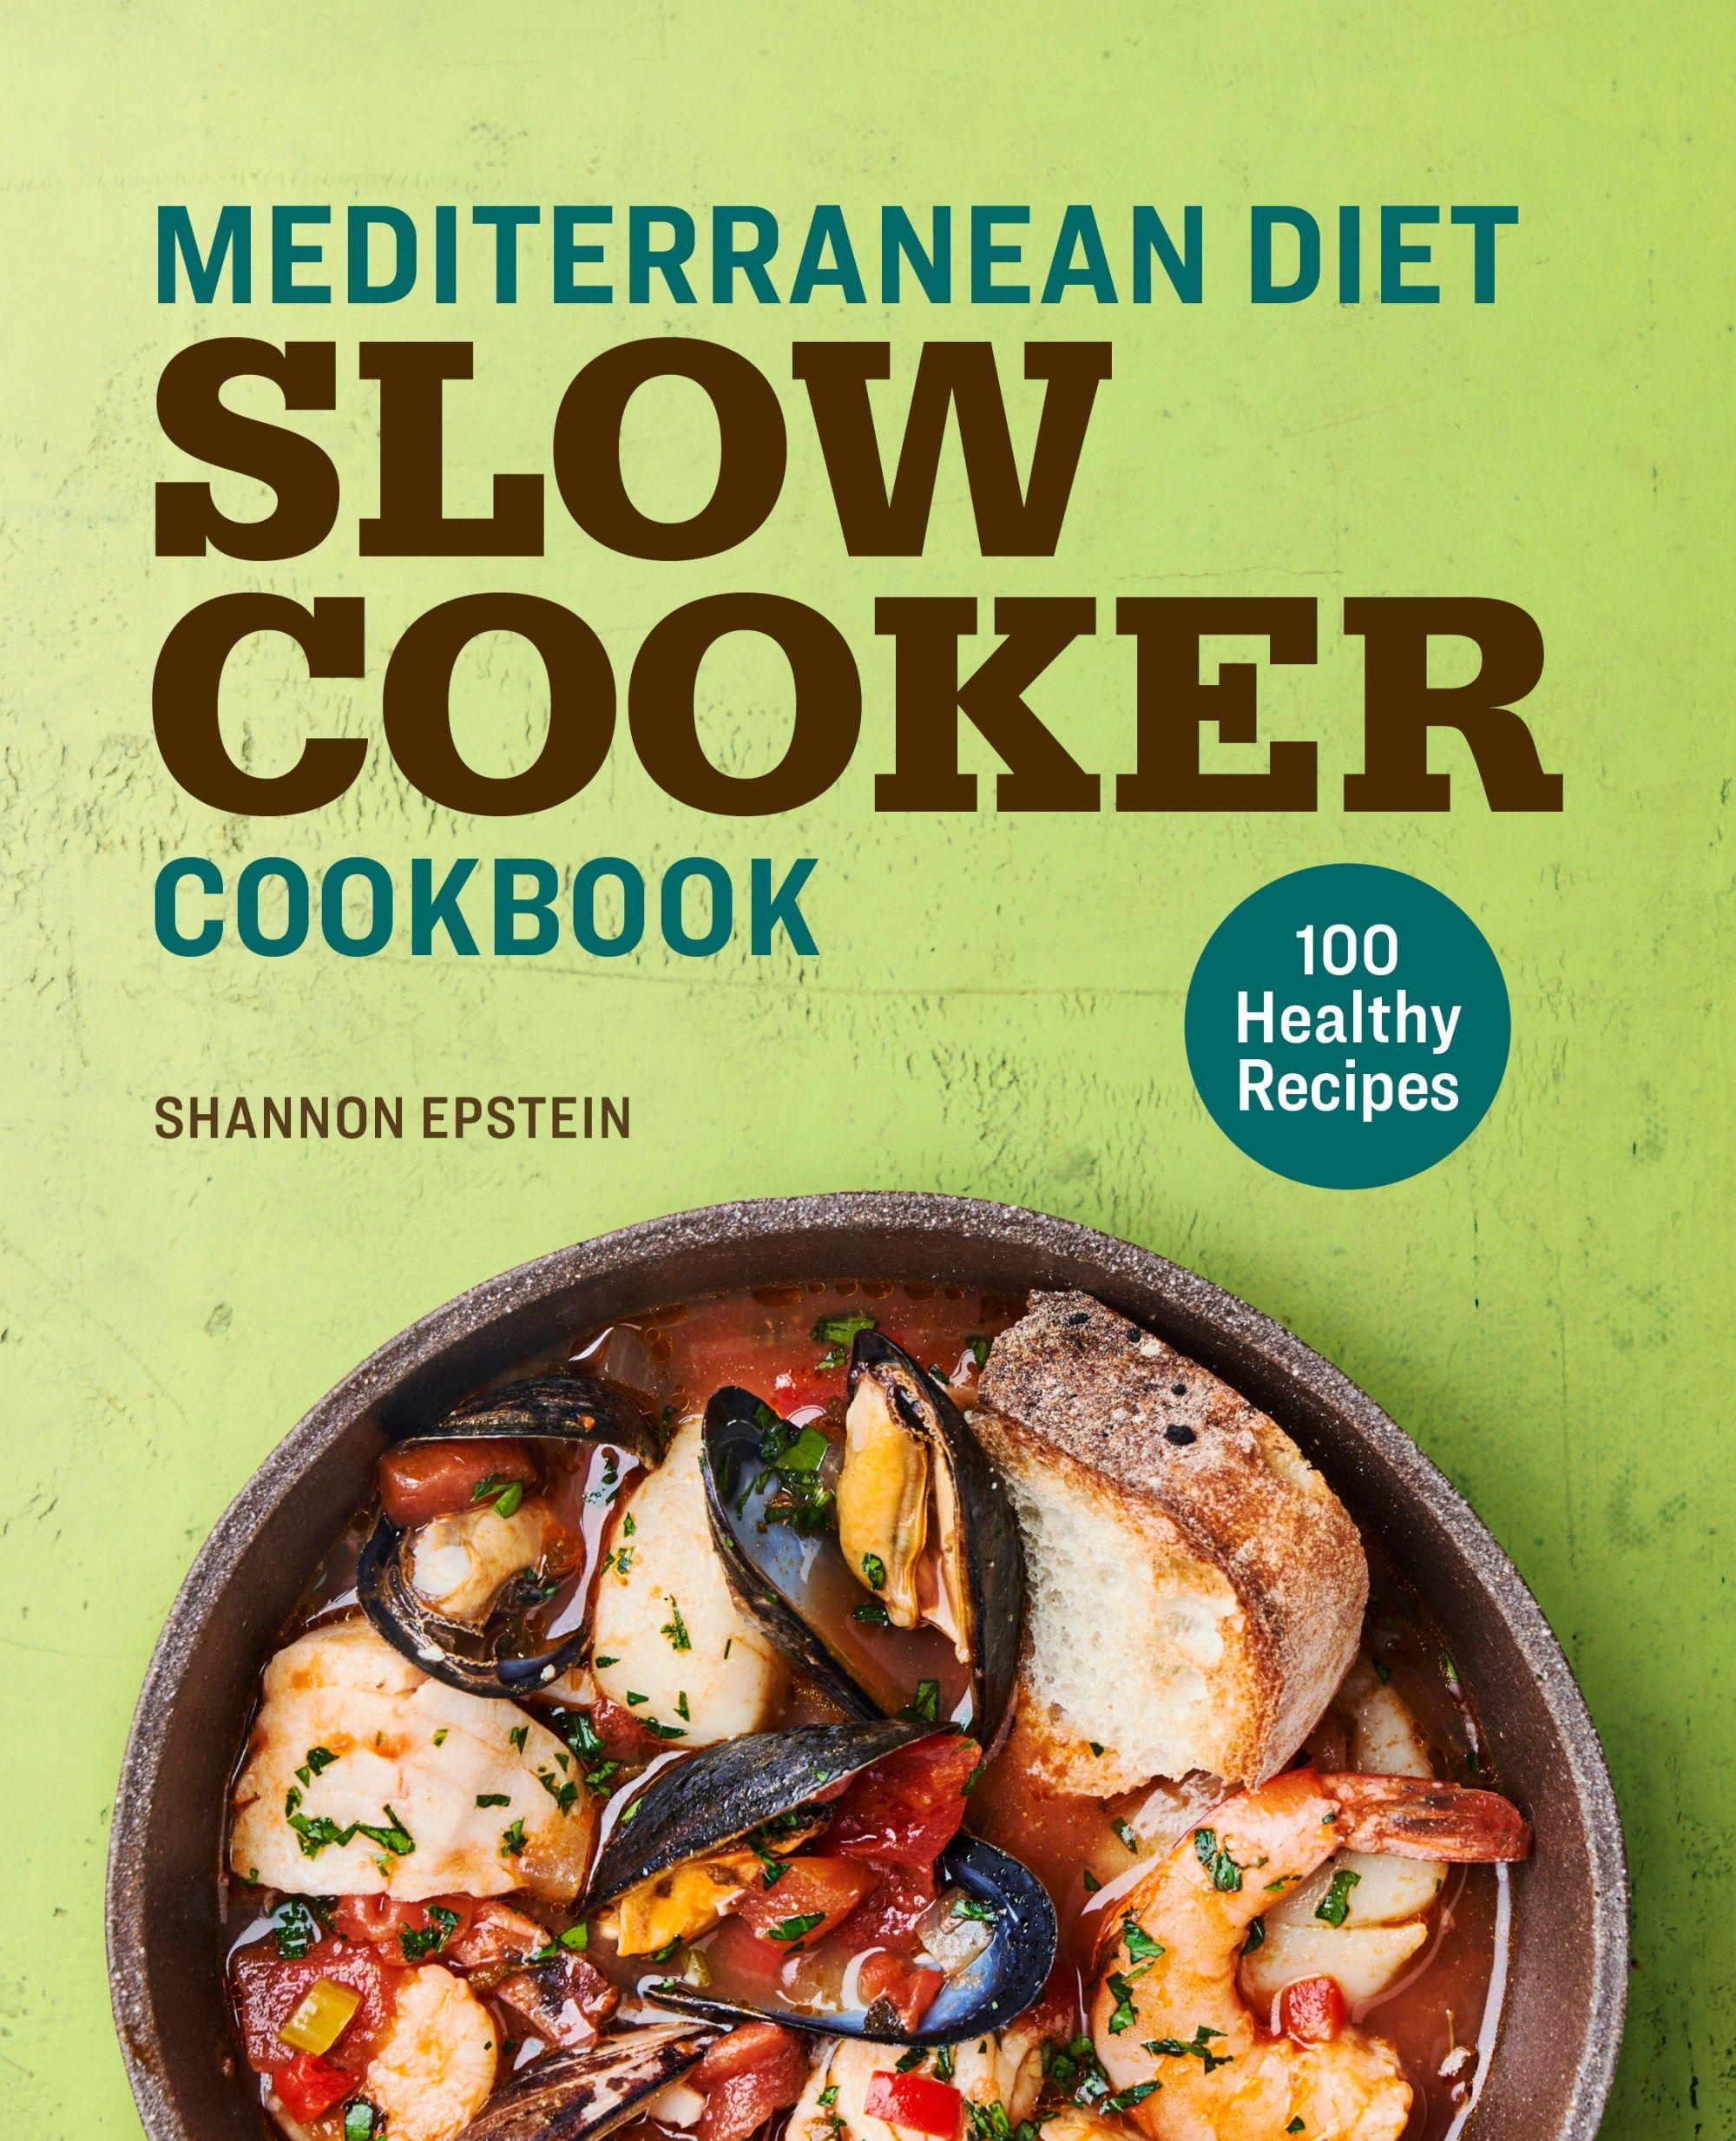 Video Slow Cooker Instant Pot Chicken Noodle Soup Recipe In 2020 Paleo Crockpot Recipes Slow Cooker Slow Cooker Steak